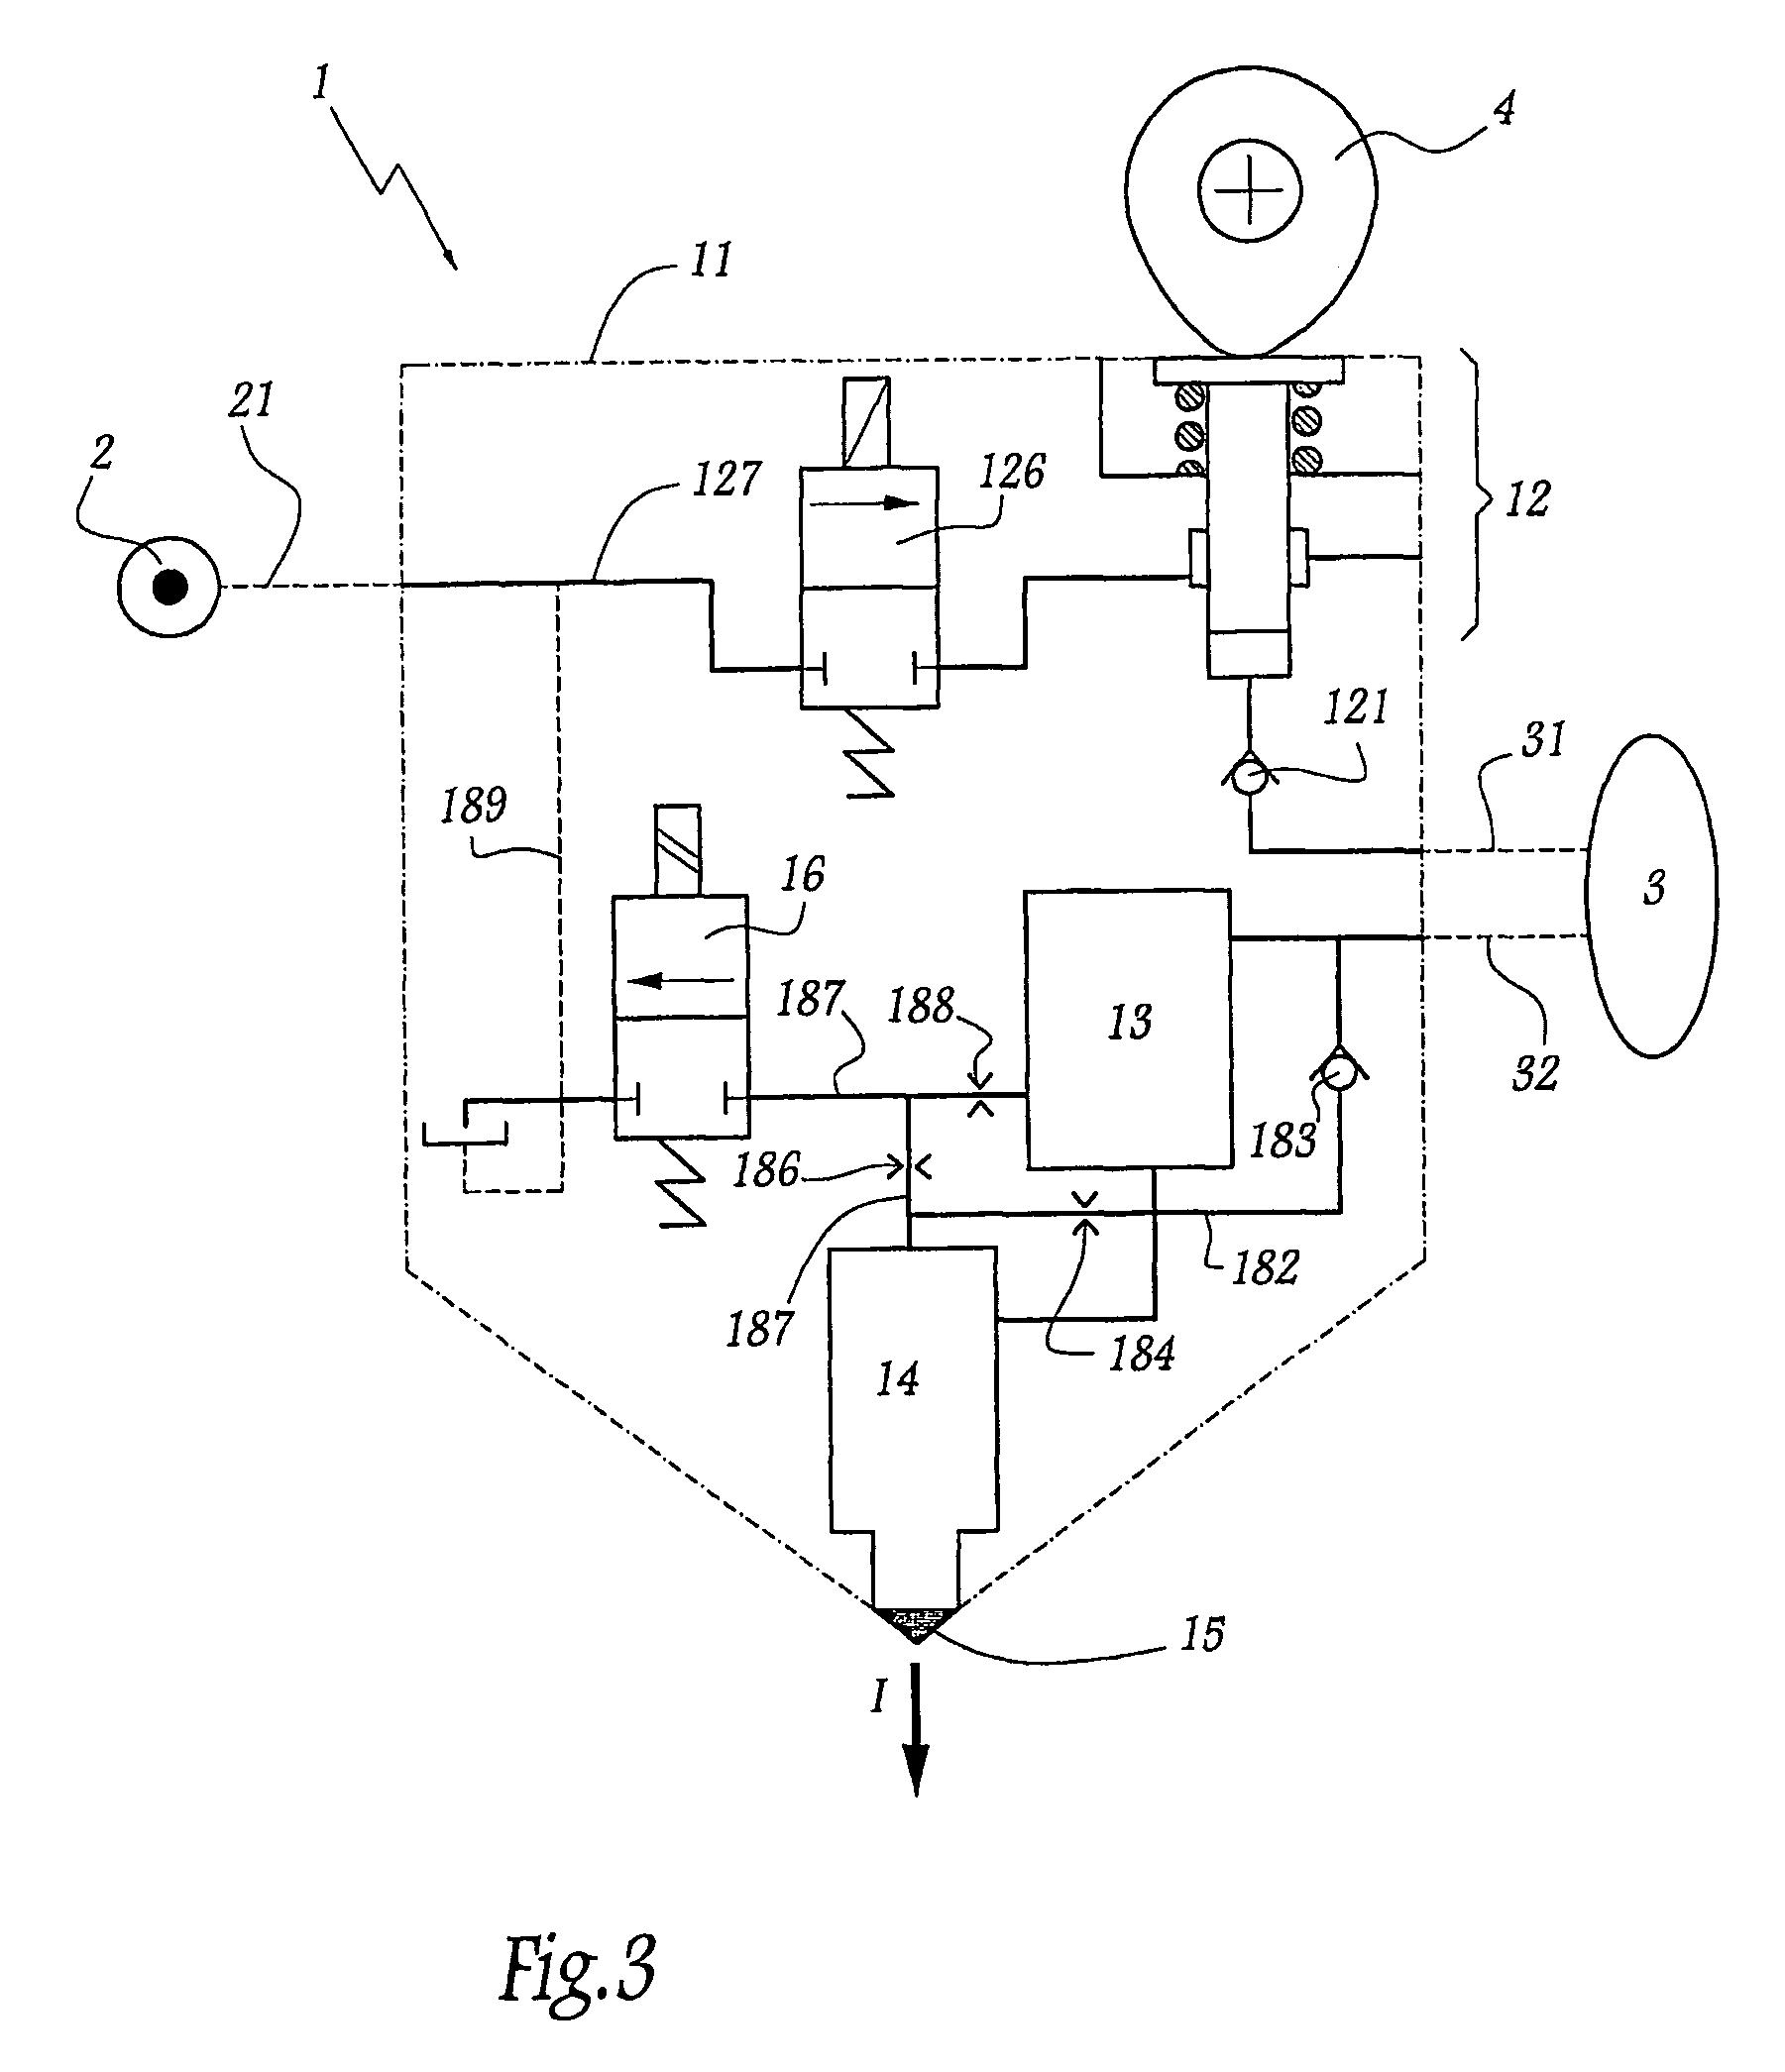 Ford 4610 Wiring Diagram 07 3500 Chevy 4x4 Wiring Diagram Begeboy Wiring Diagram Source